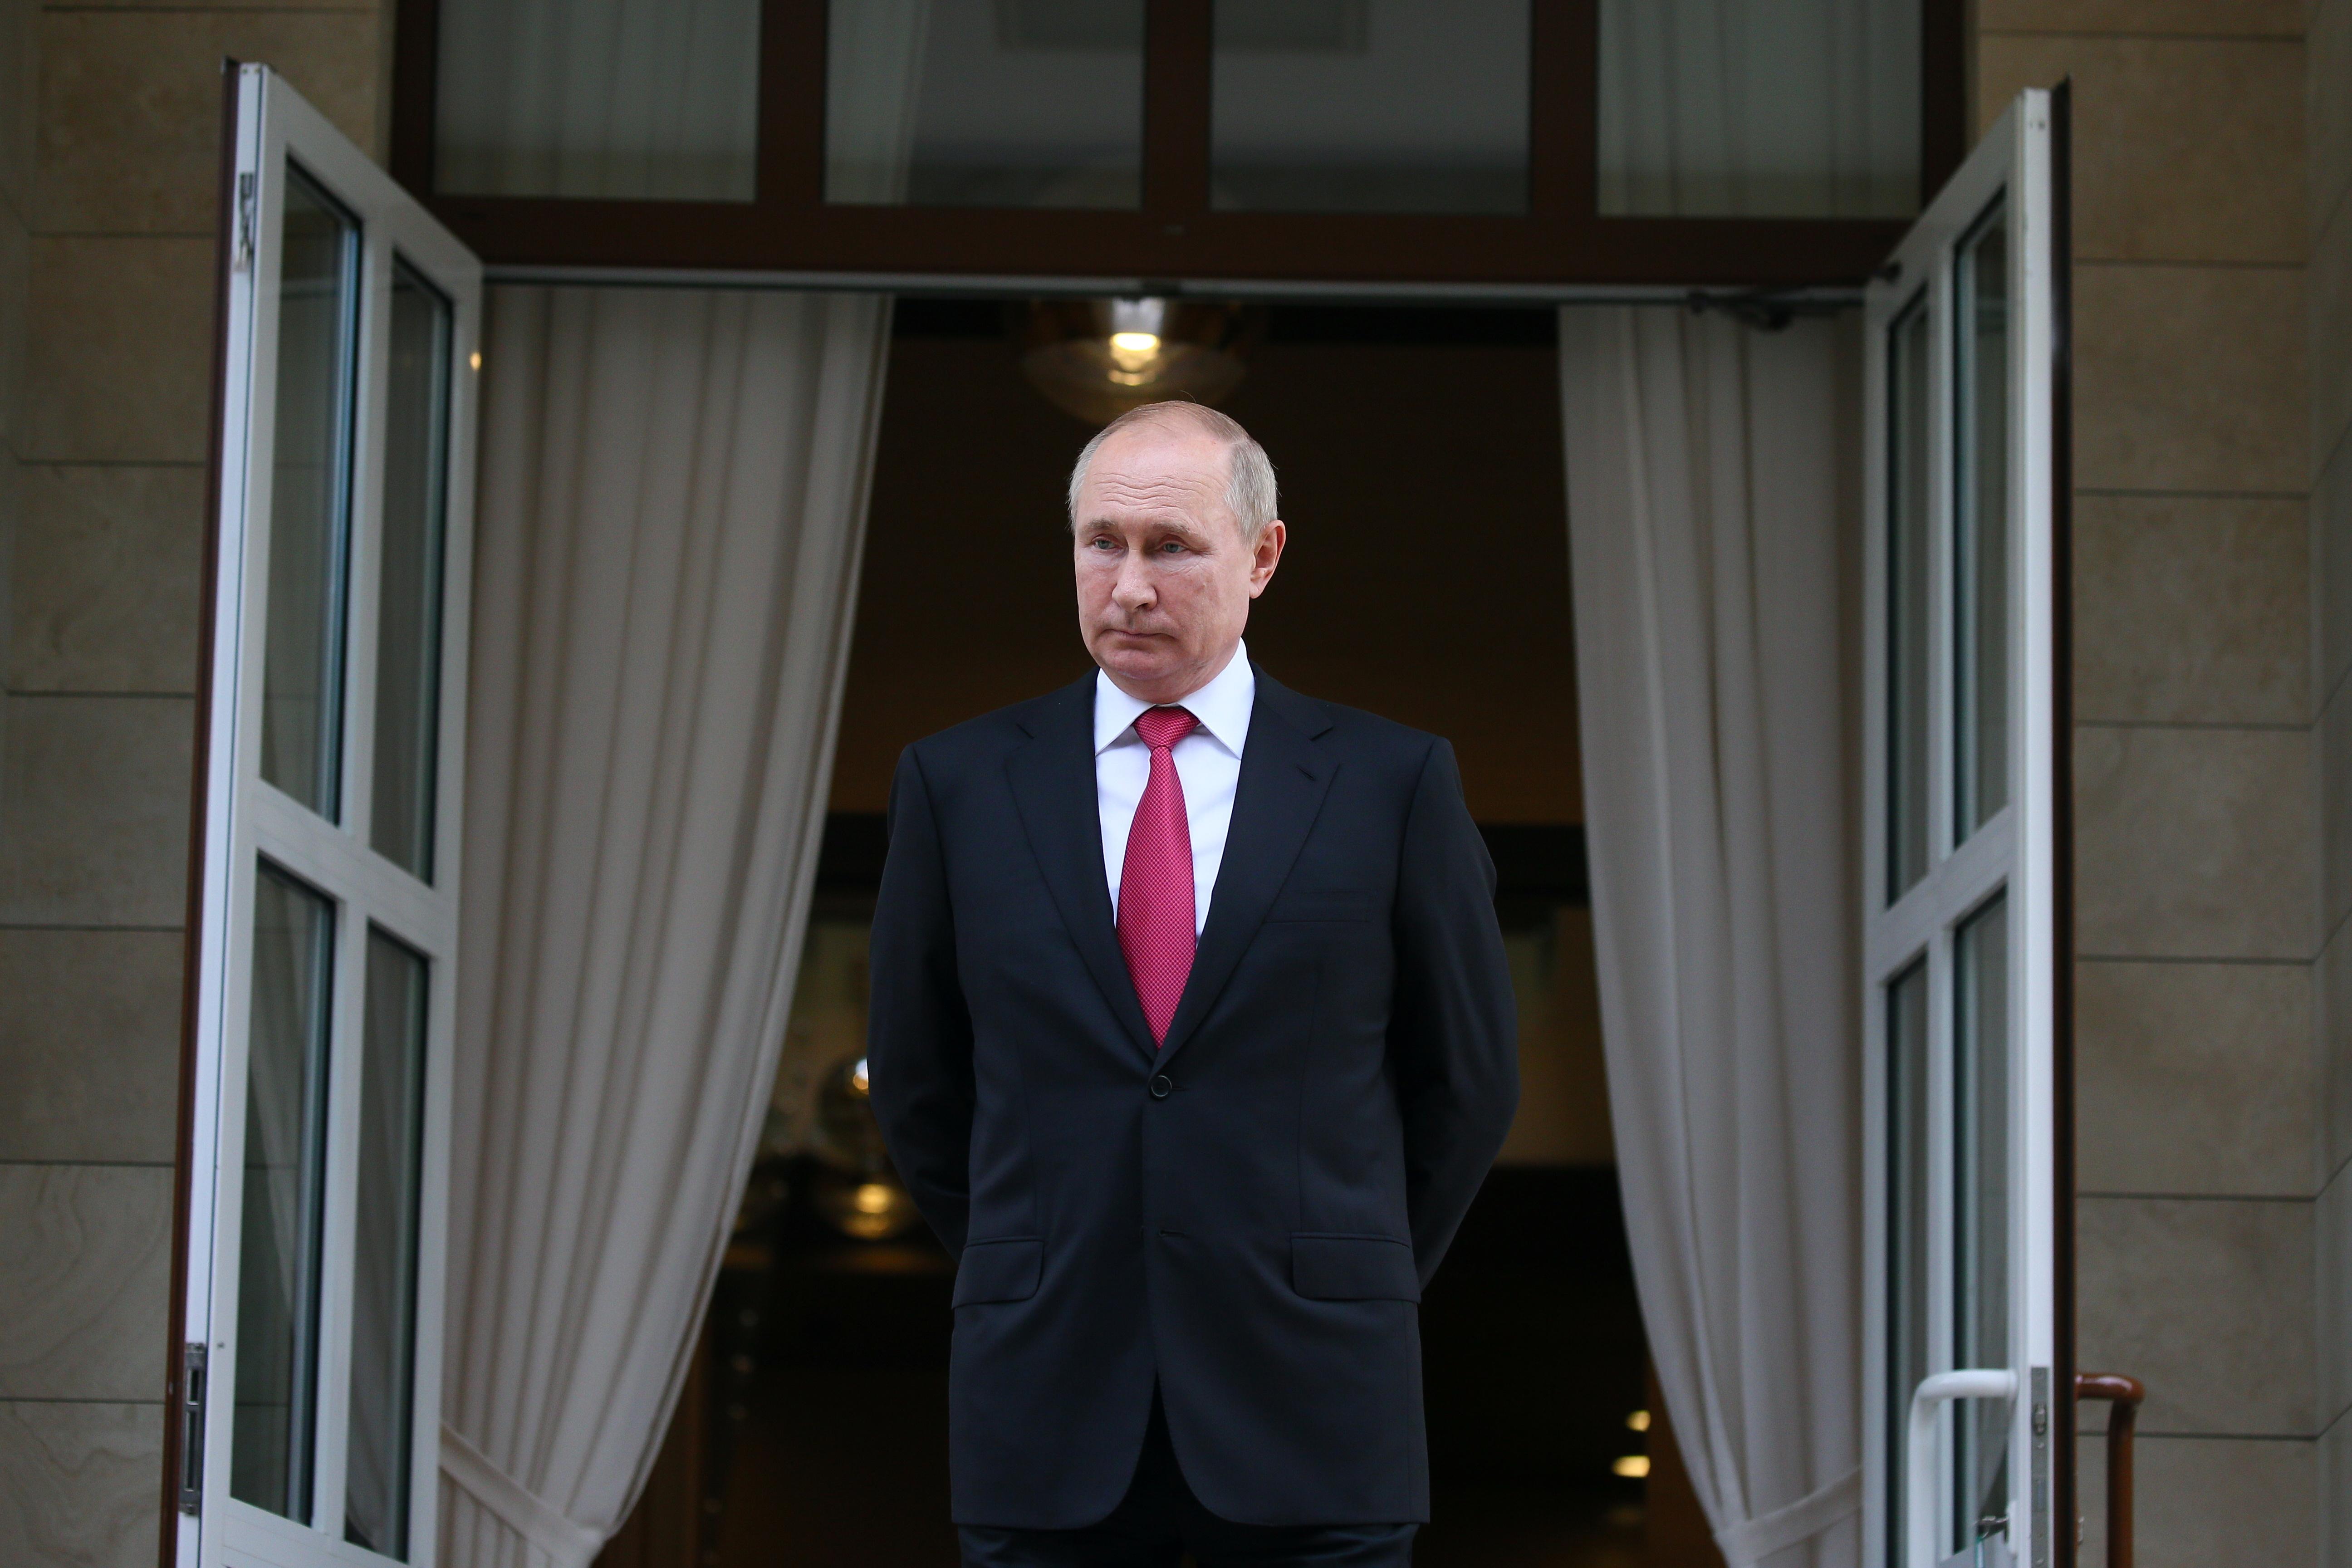 Russian President Vladimir Putin is seen at the Bocharov Ruchei state residence after a meeting with Turkish President Tayyip Erdogan in Sochi, Russia September 29, 2021. Sputnik/Vladimir Smirnov/Pool via REUTERS